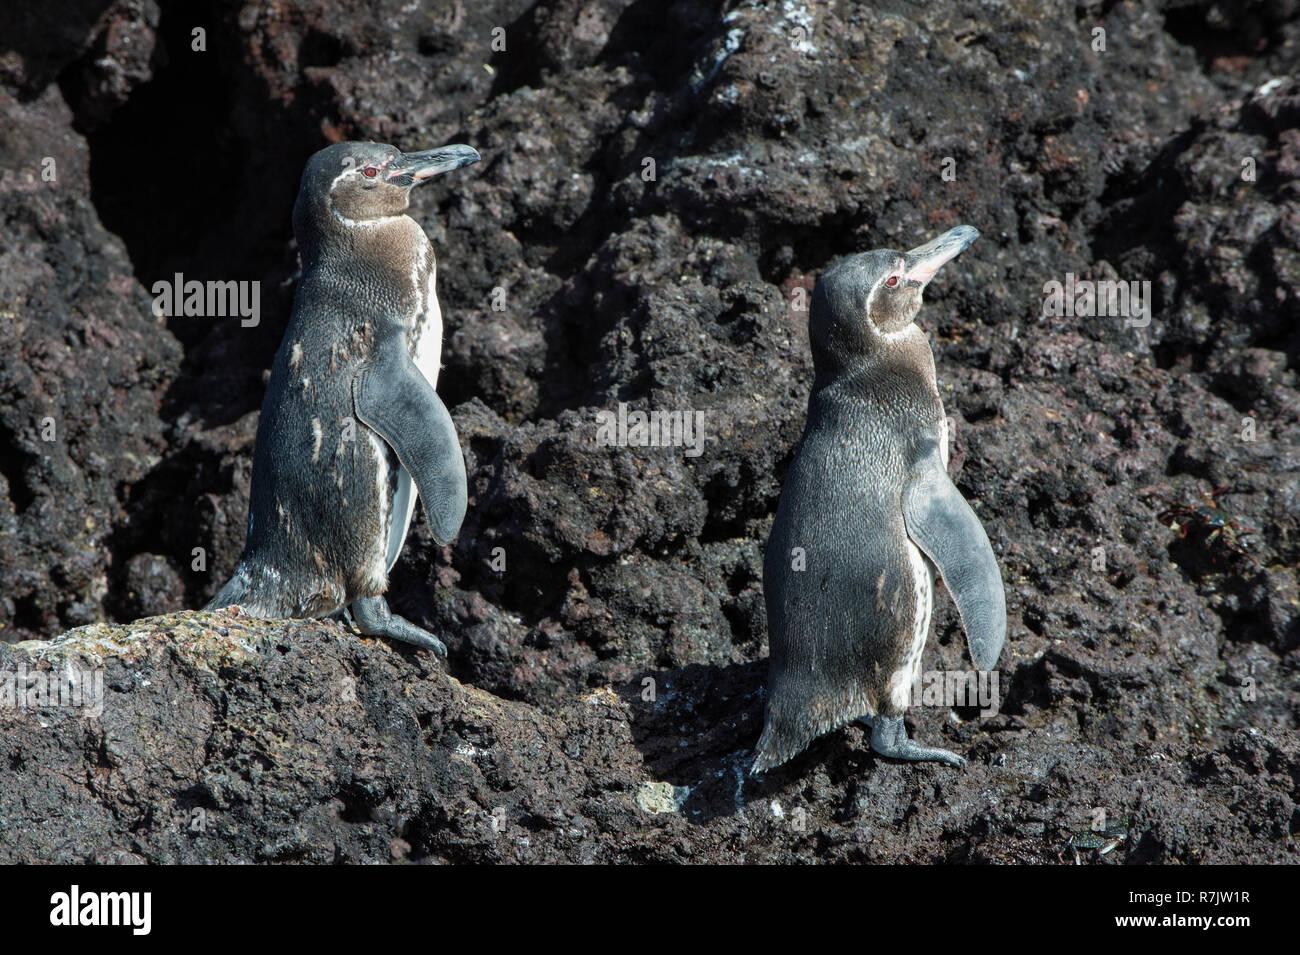 Galapagos Penguins (Spheniscus mendiculus), Insel Isabela, Galapagosinseln, Ecuador - Stock Image